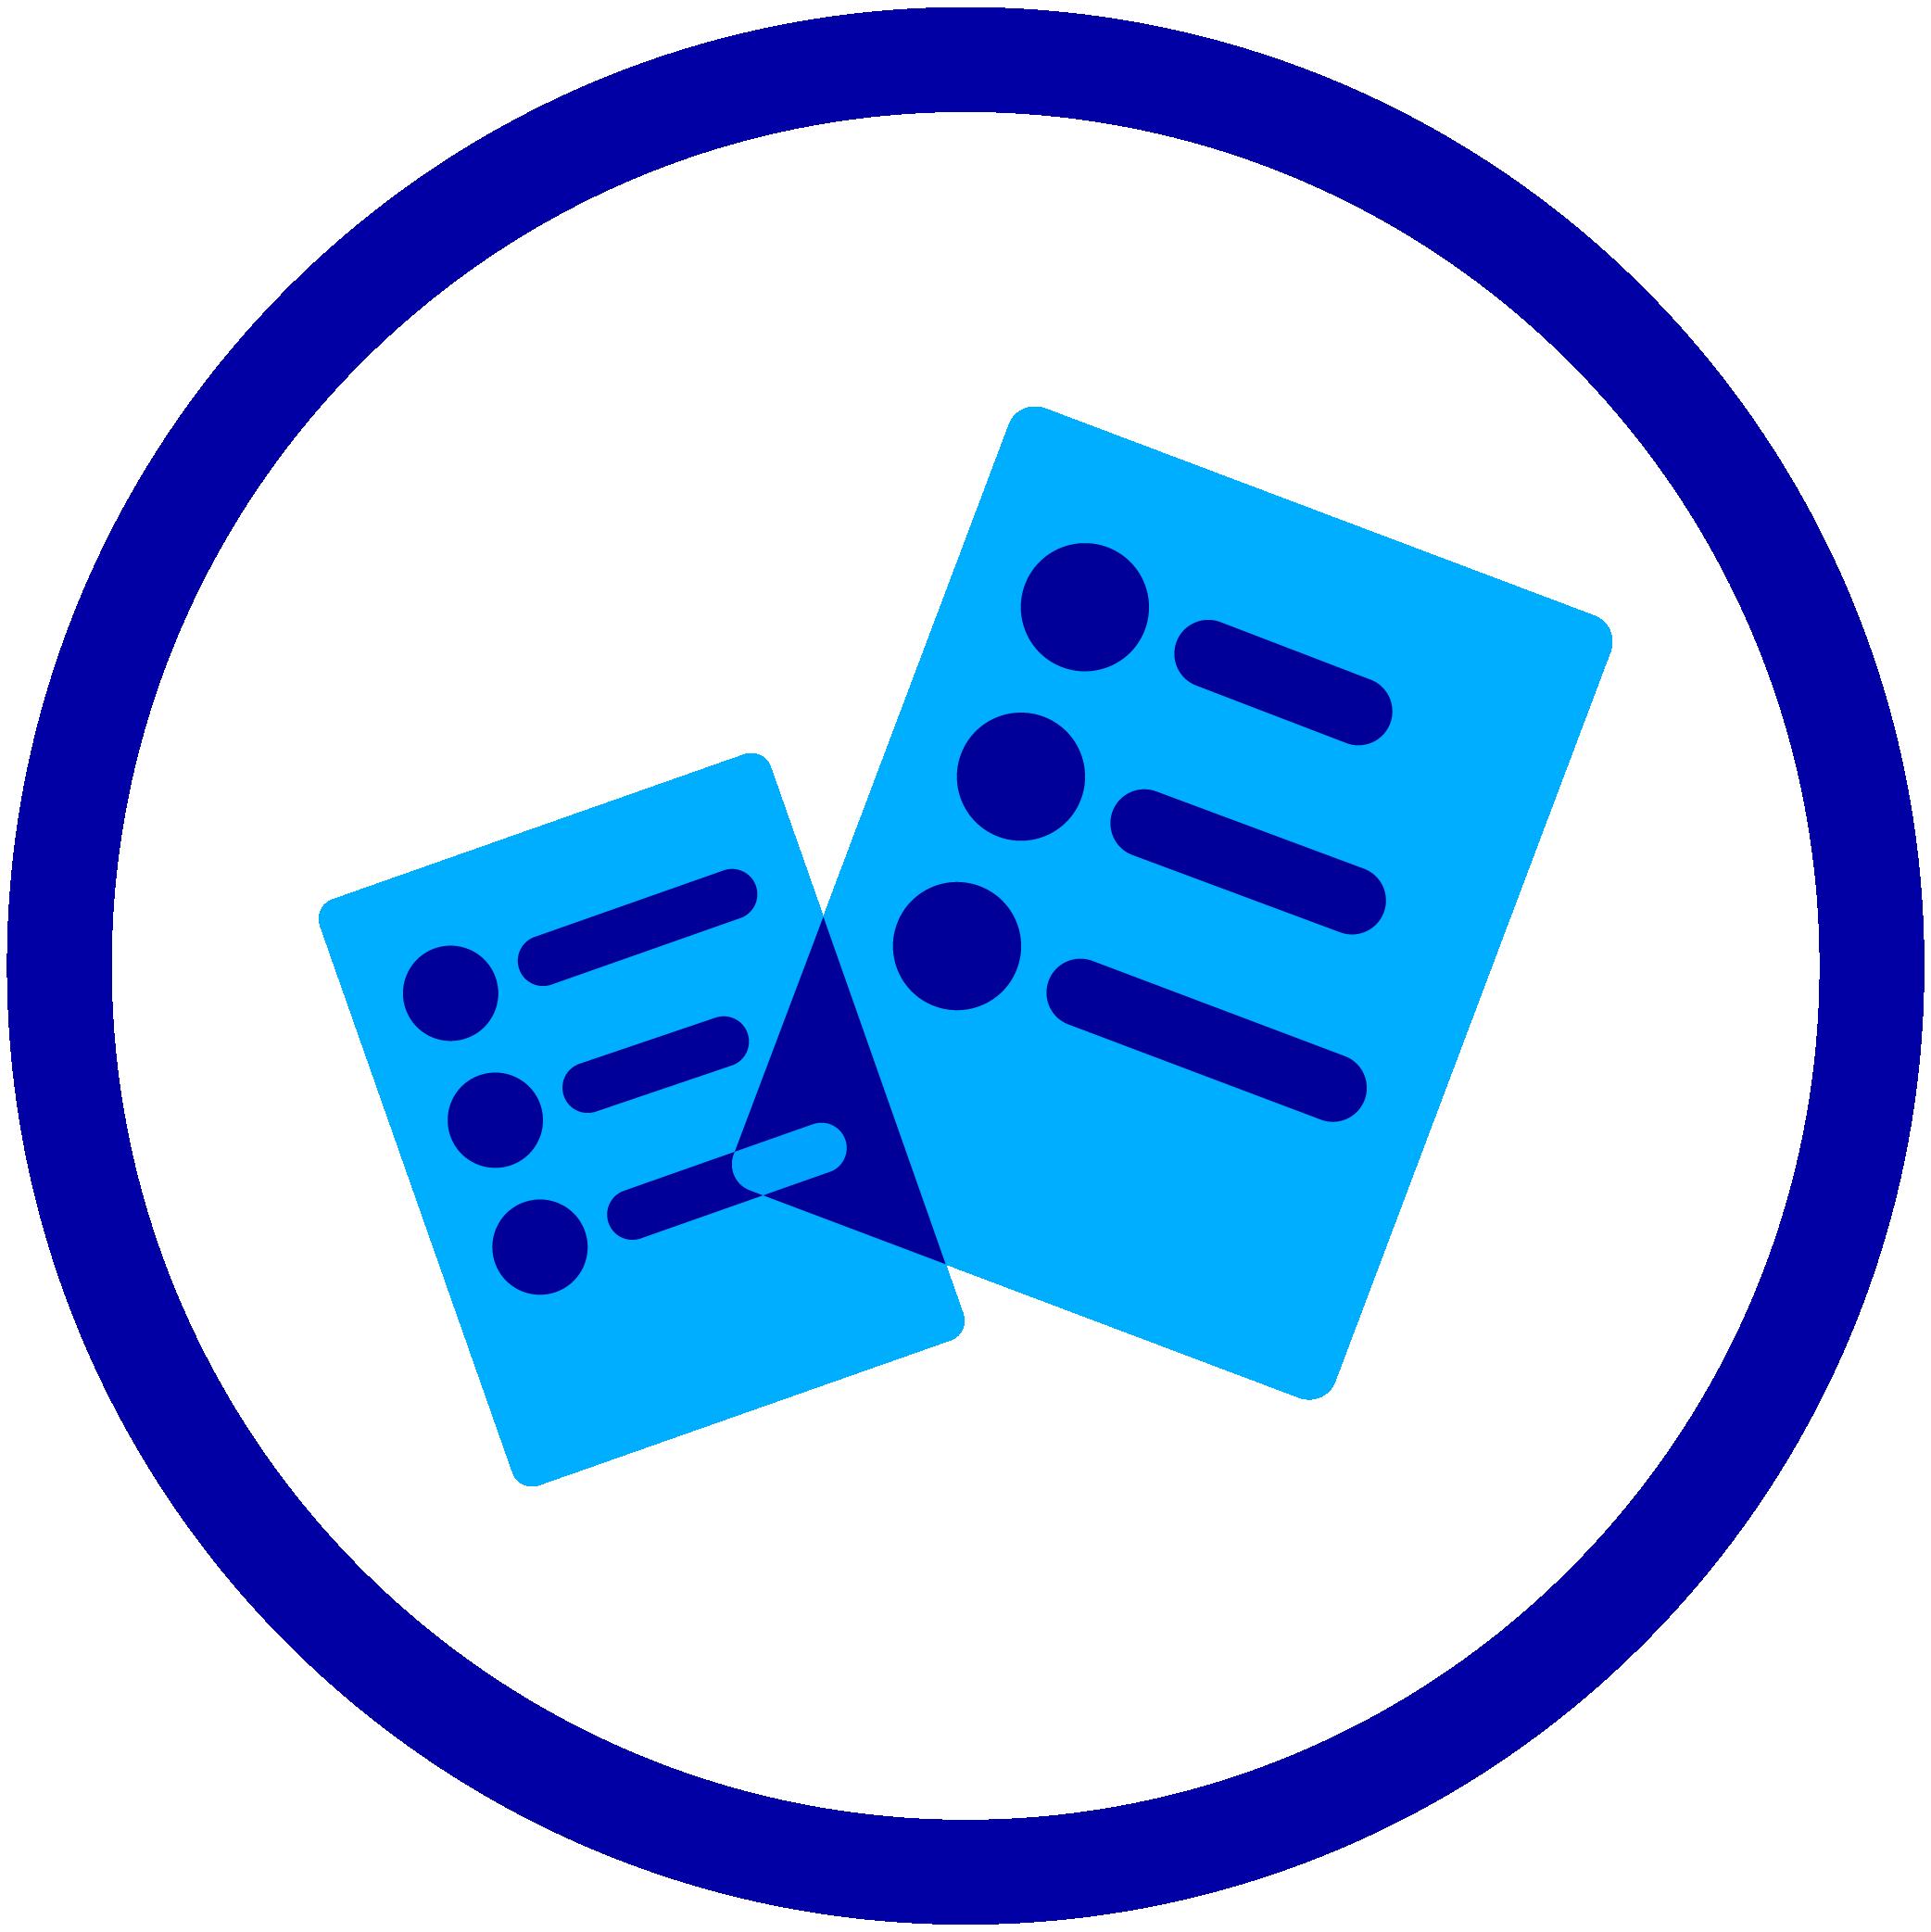 https://bx.fi-group.com/wp-content/uploads/sites/8/2021/09/blue-icons-set_1-07.png